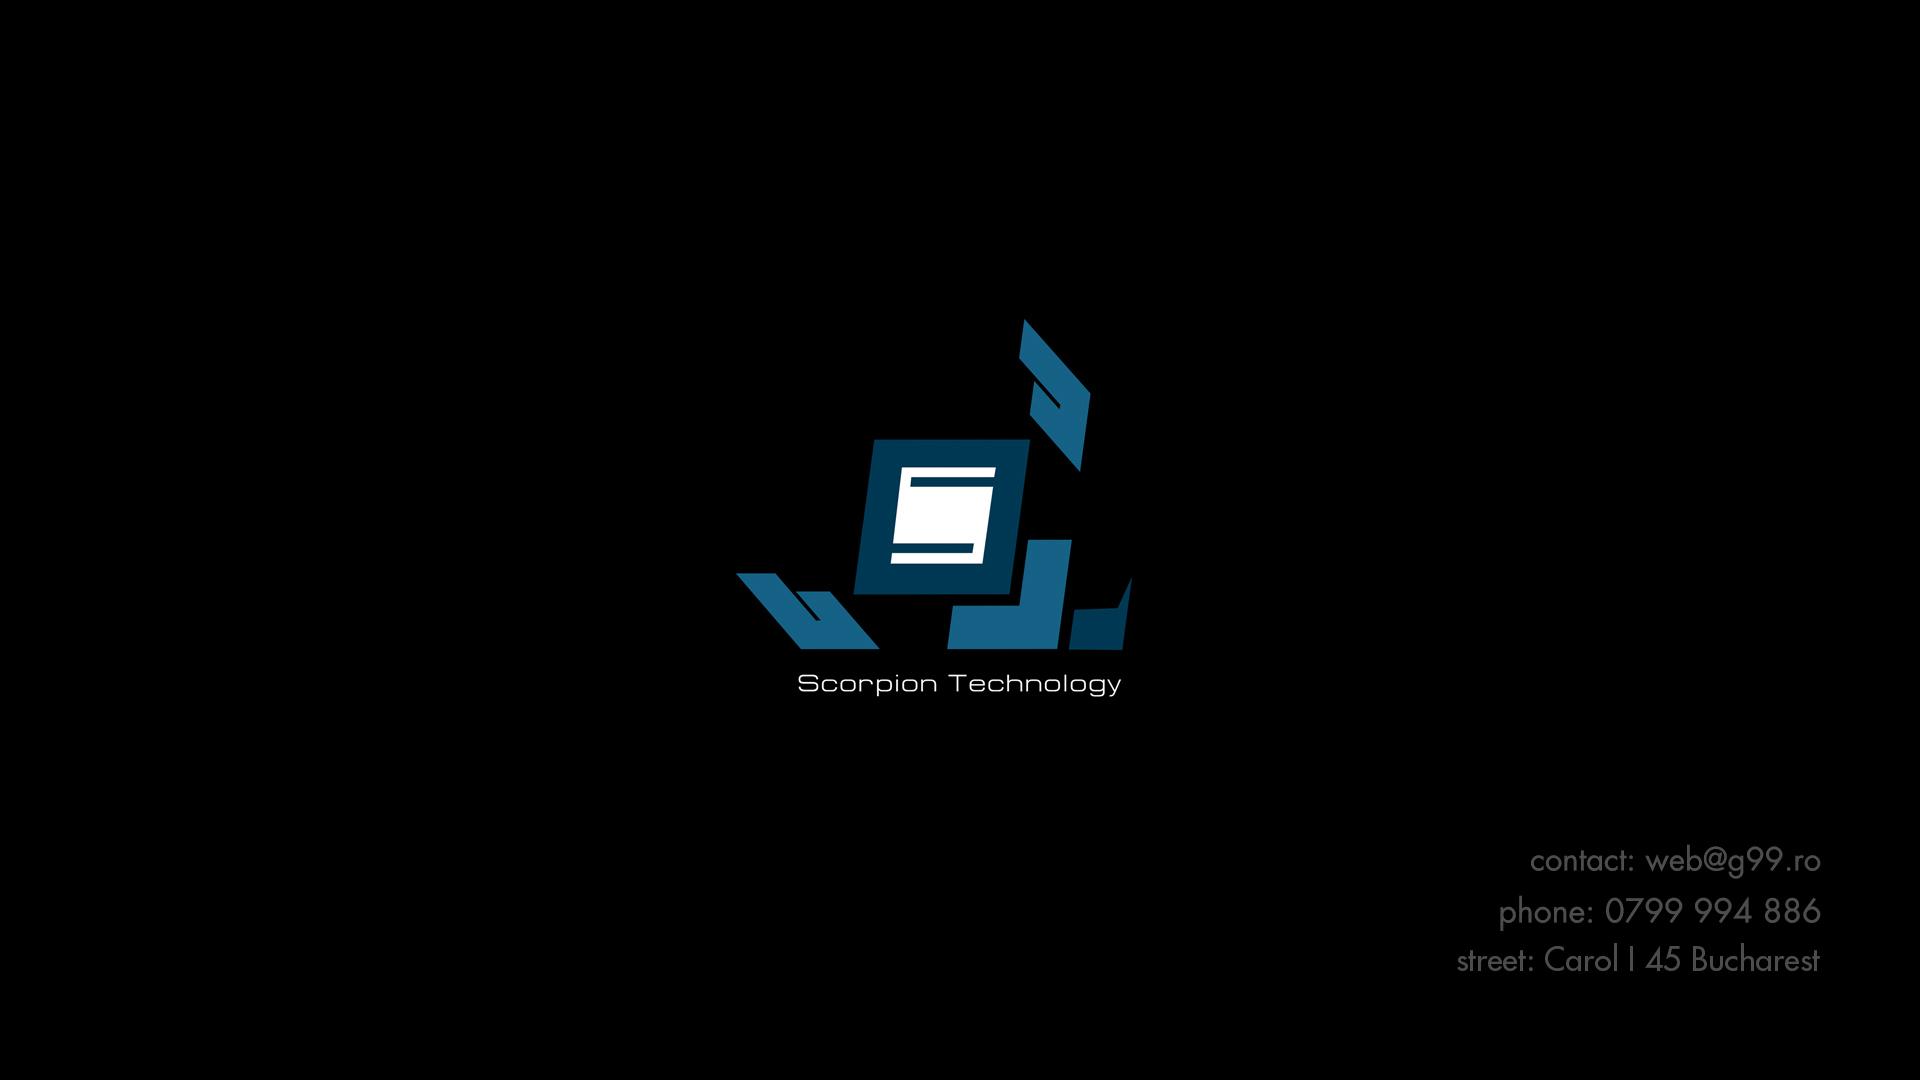 Web design Scorpion Technology - G99